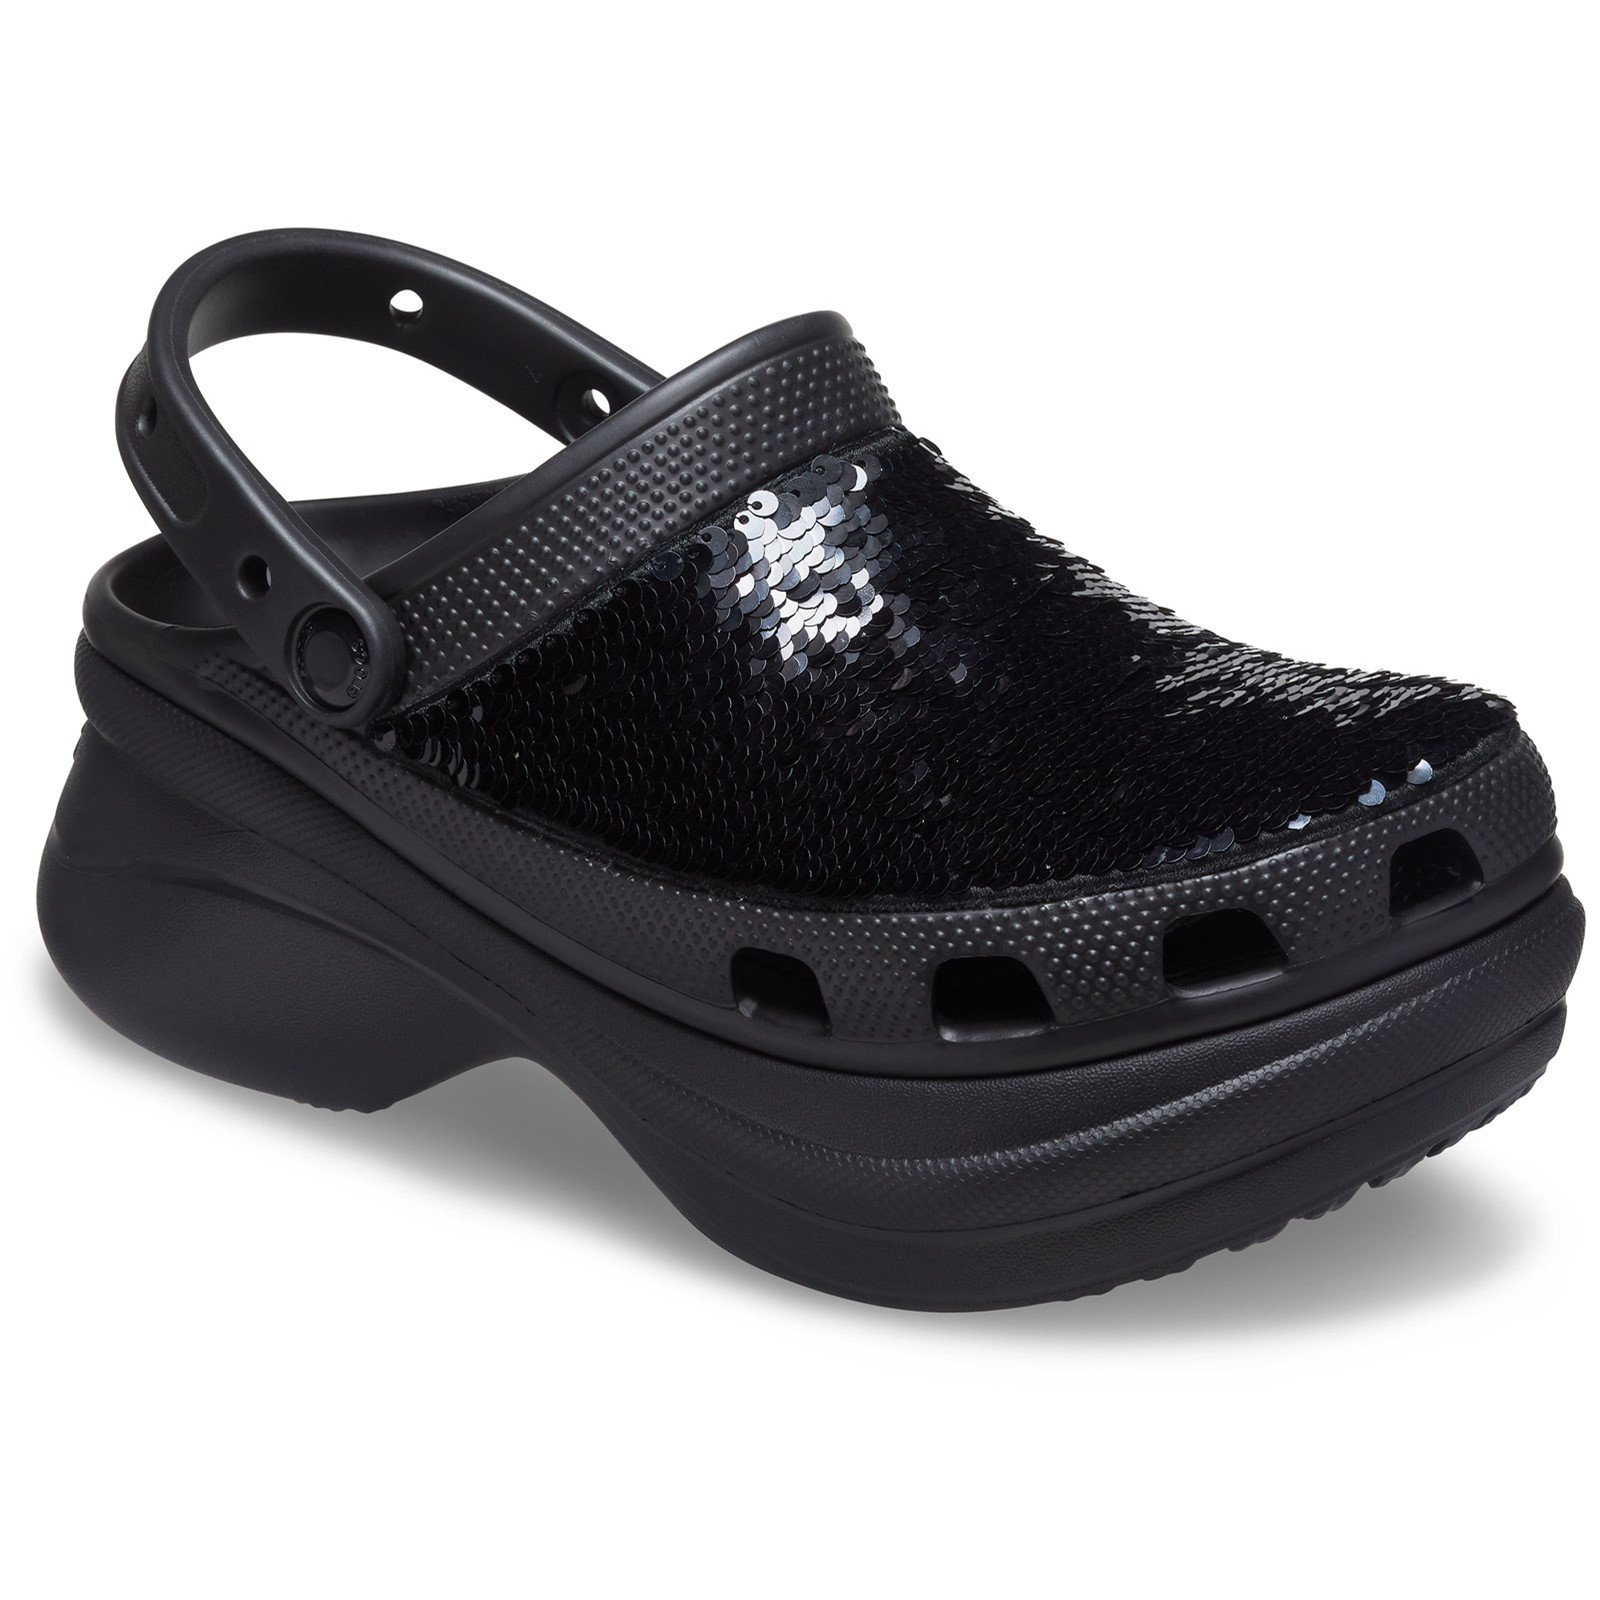 Crocs Women's Classic Bae Sequin Clog Multicolor 33511-57313 - Black/Multi 3